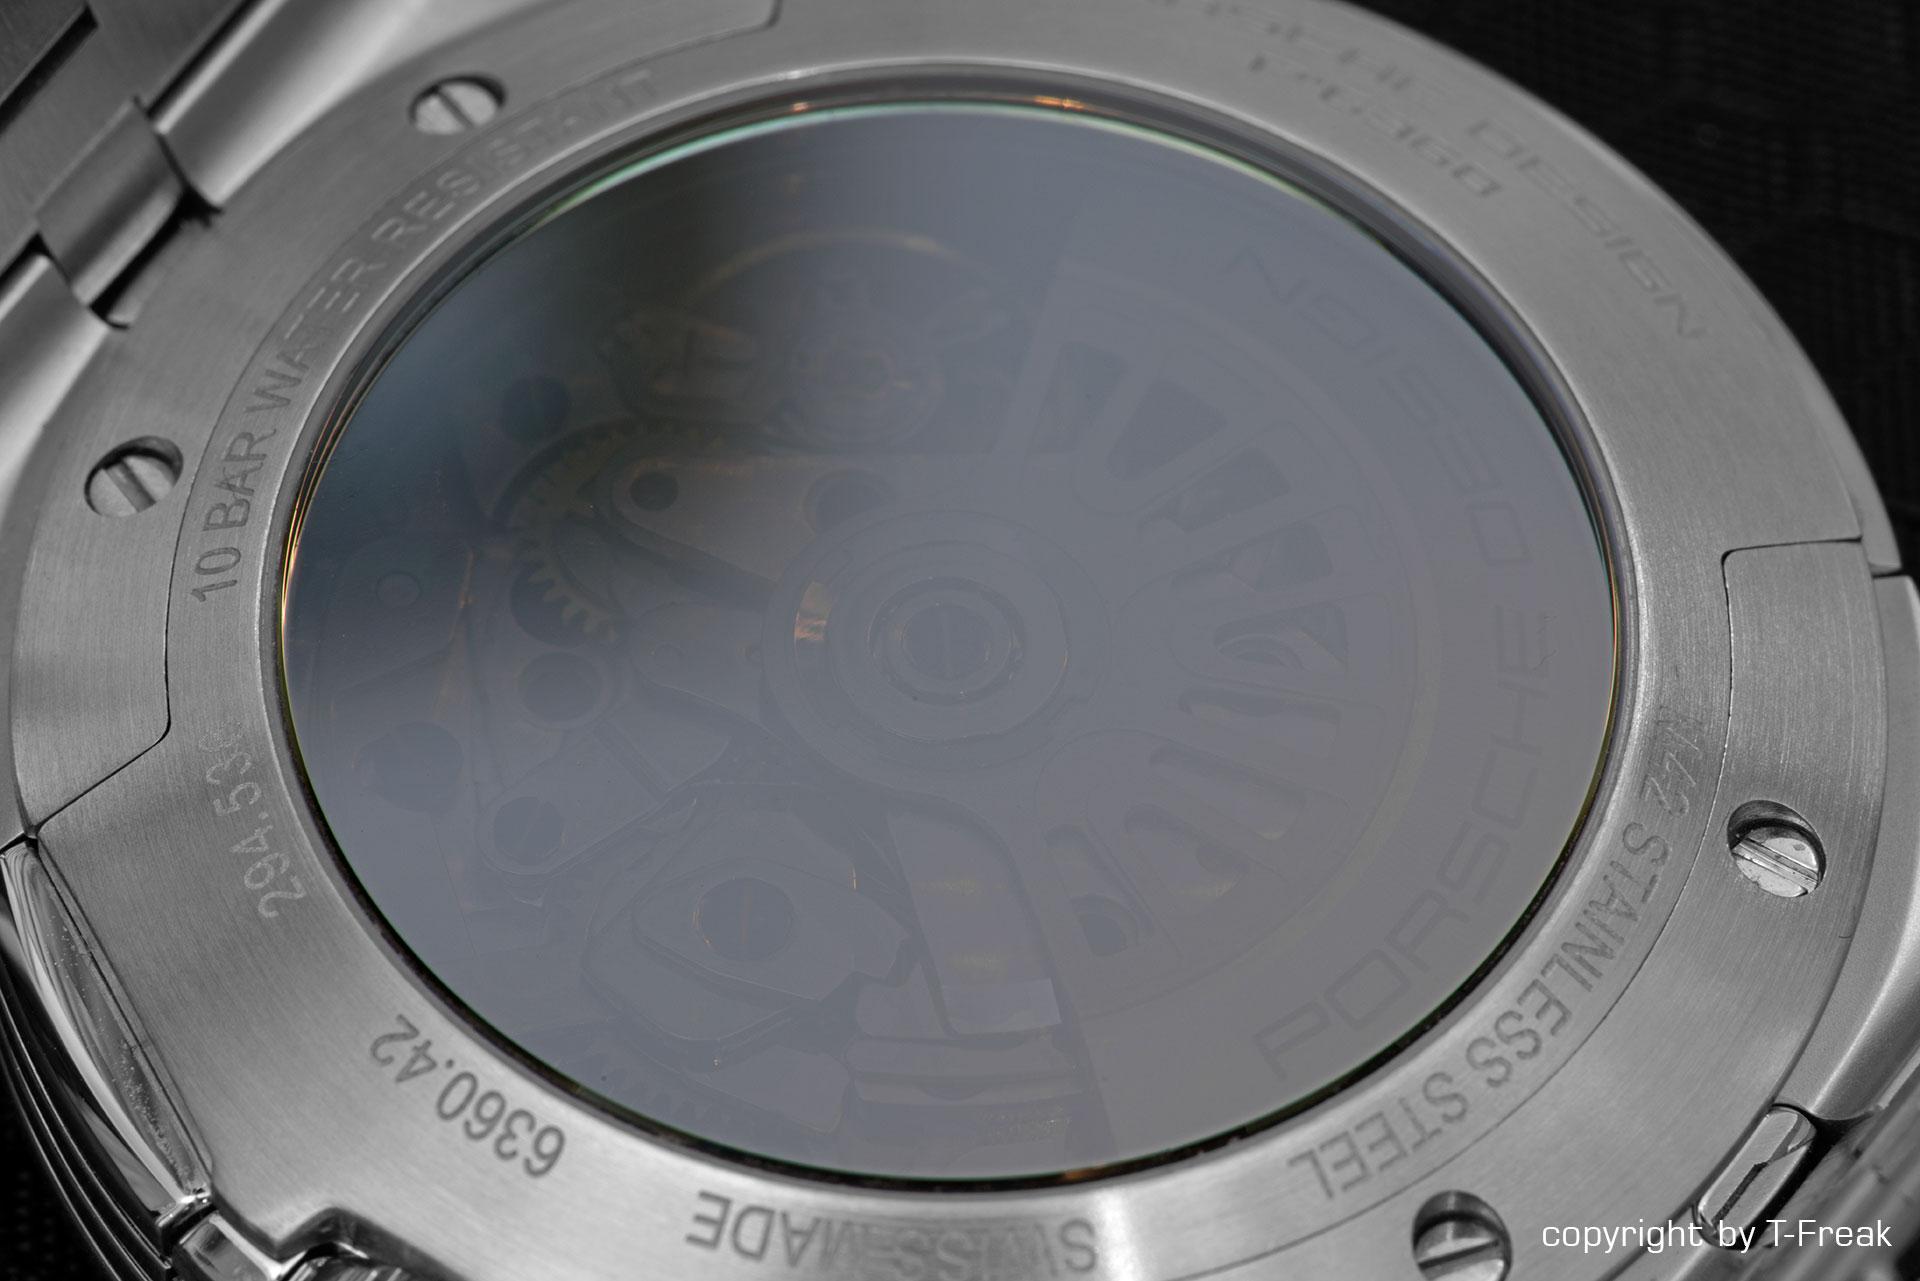 PD_20.jpg